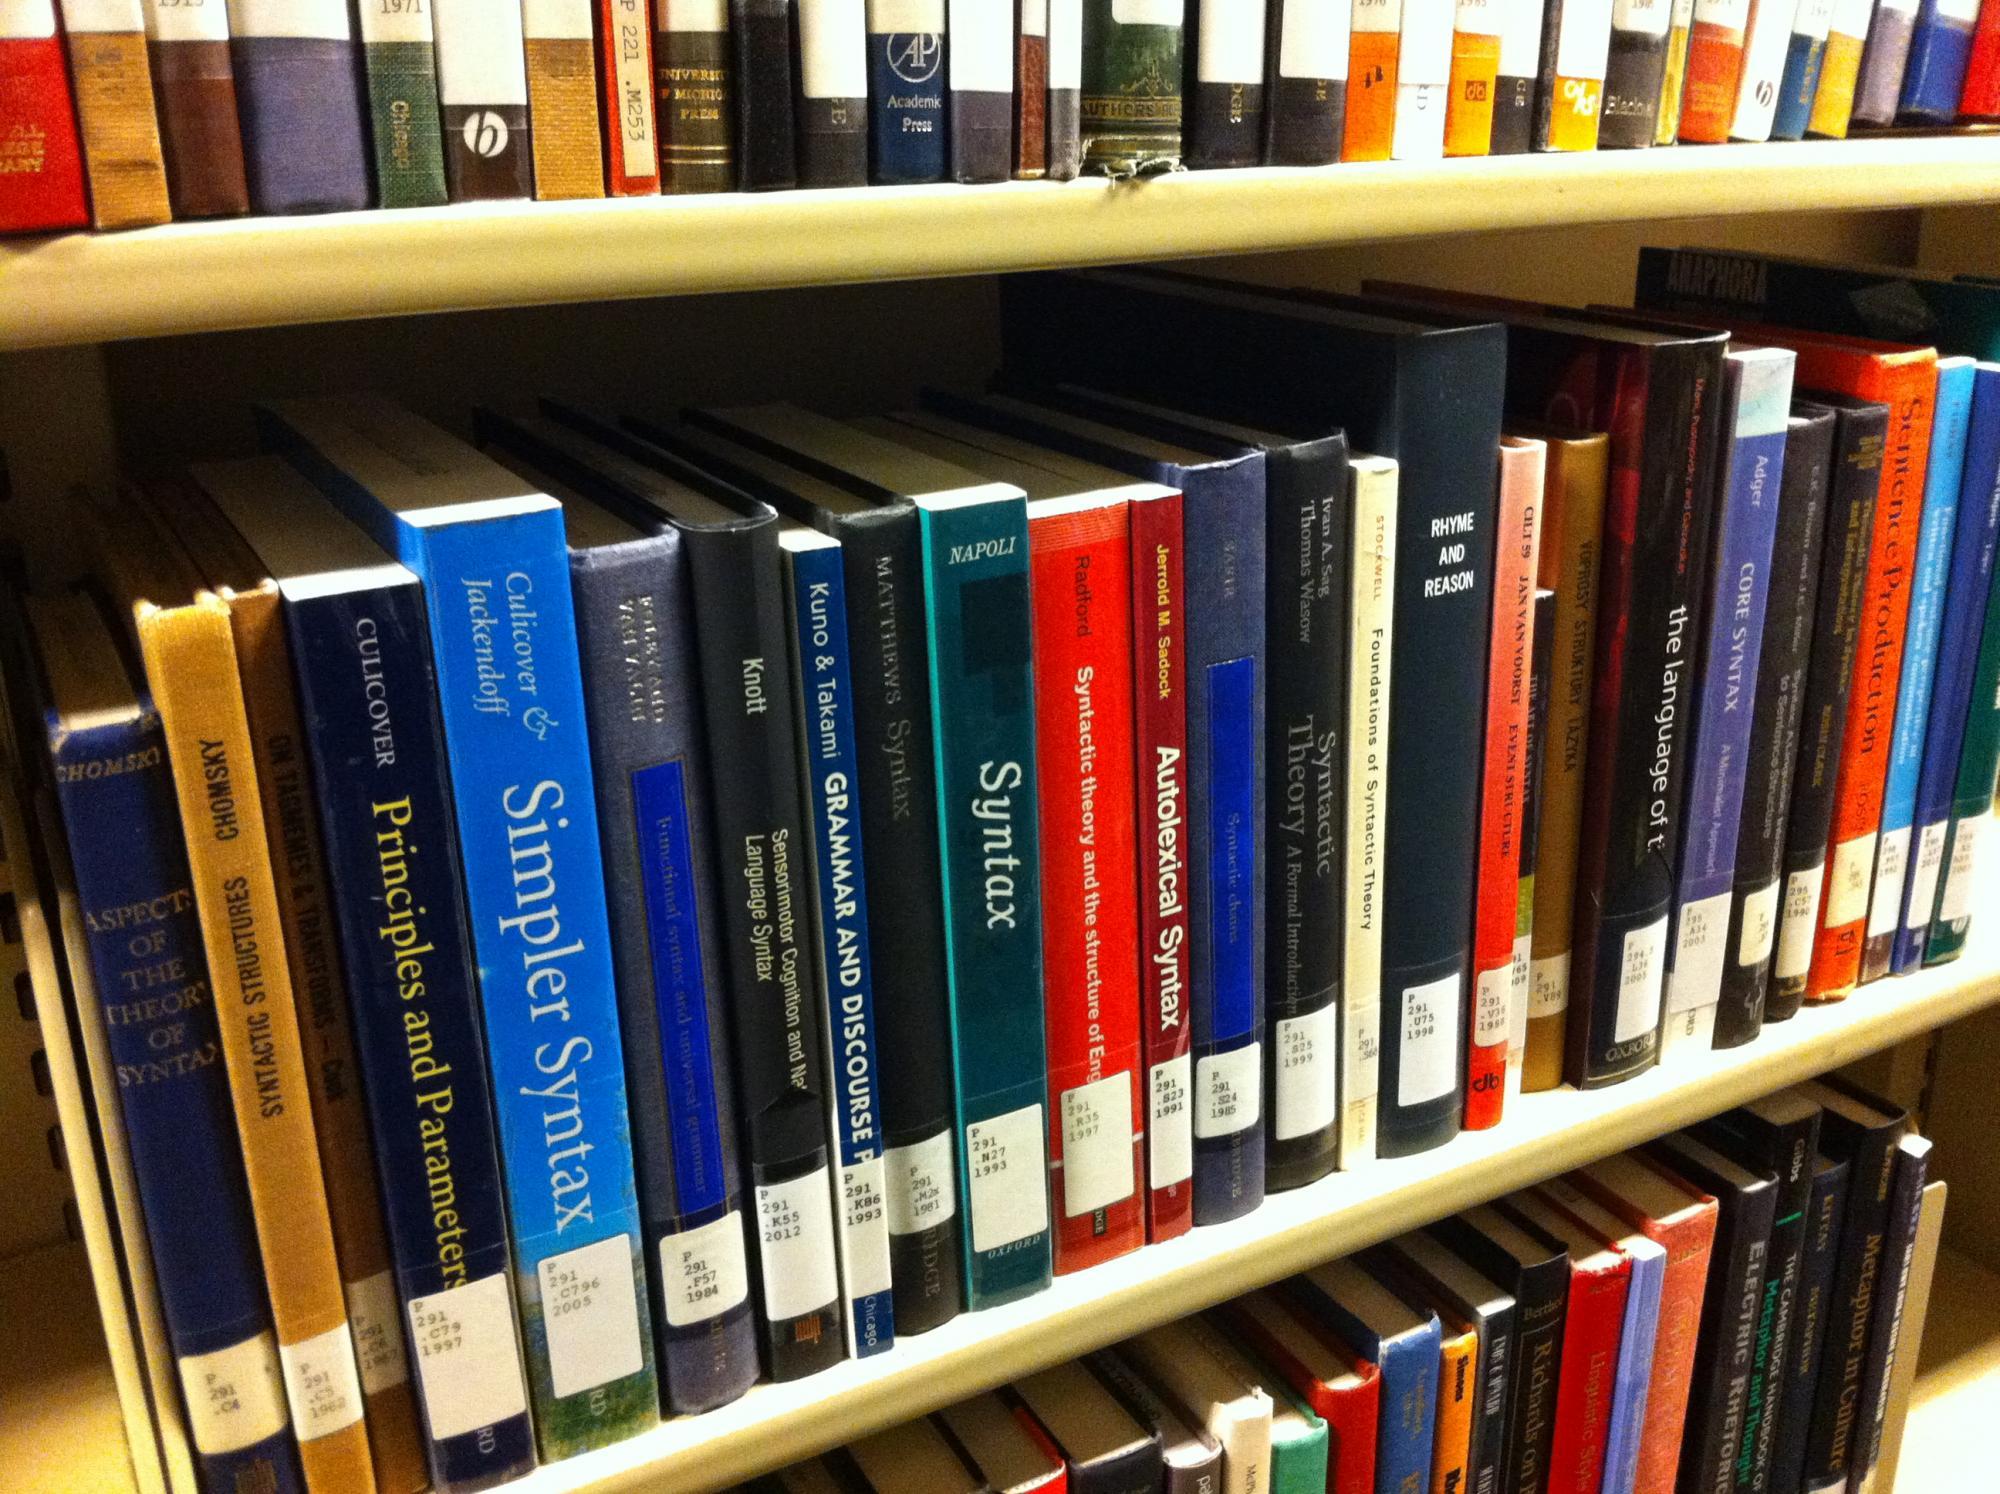 Linguistics books